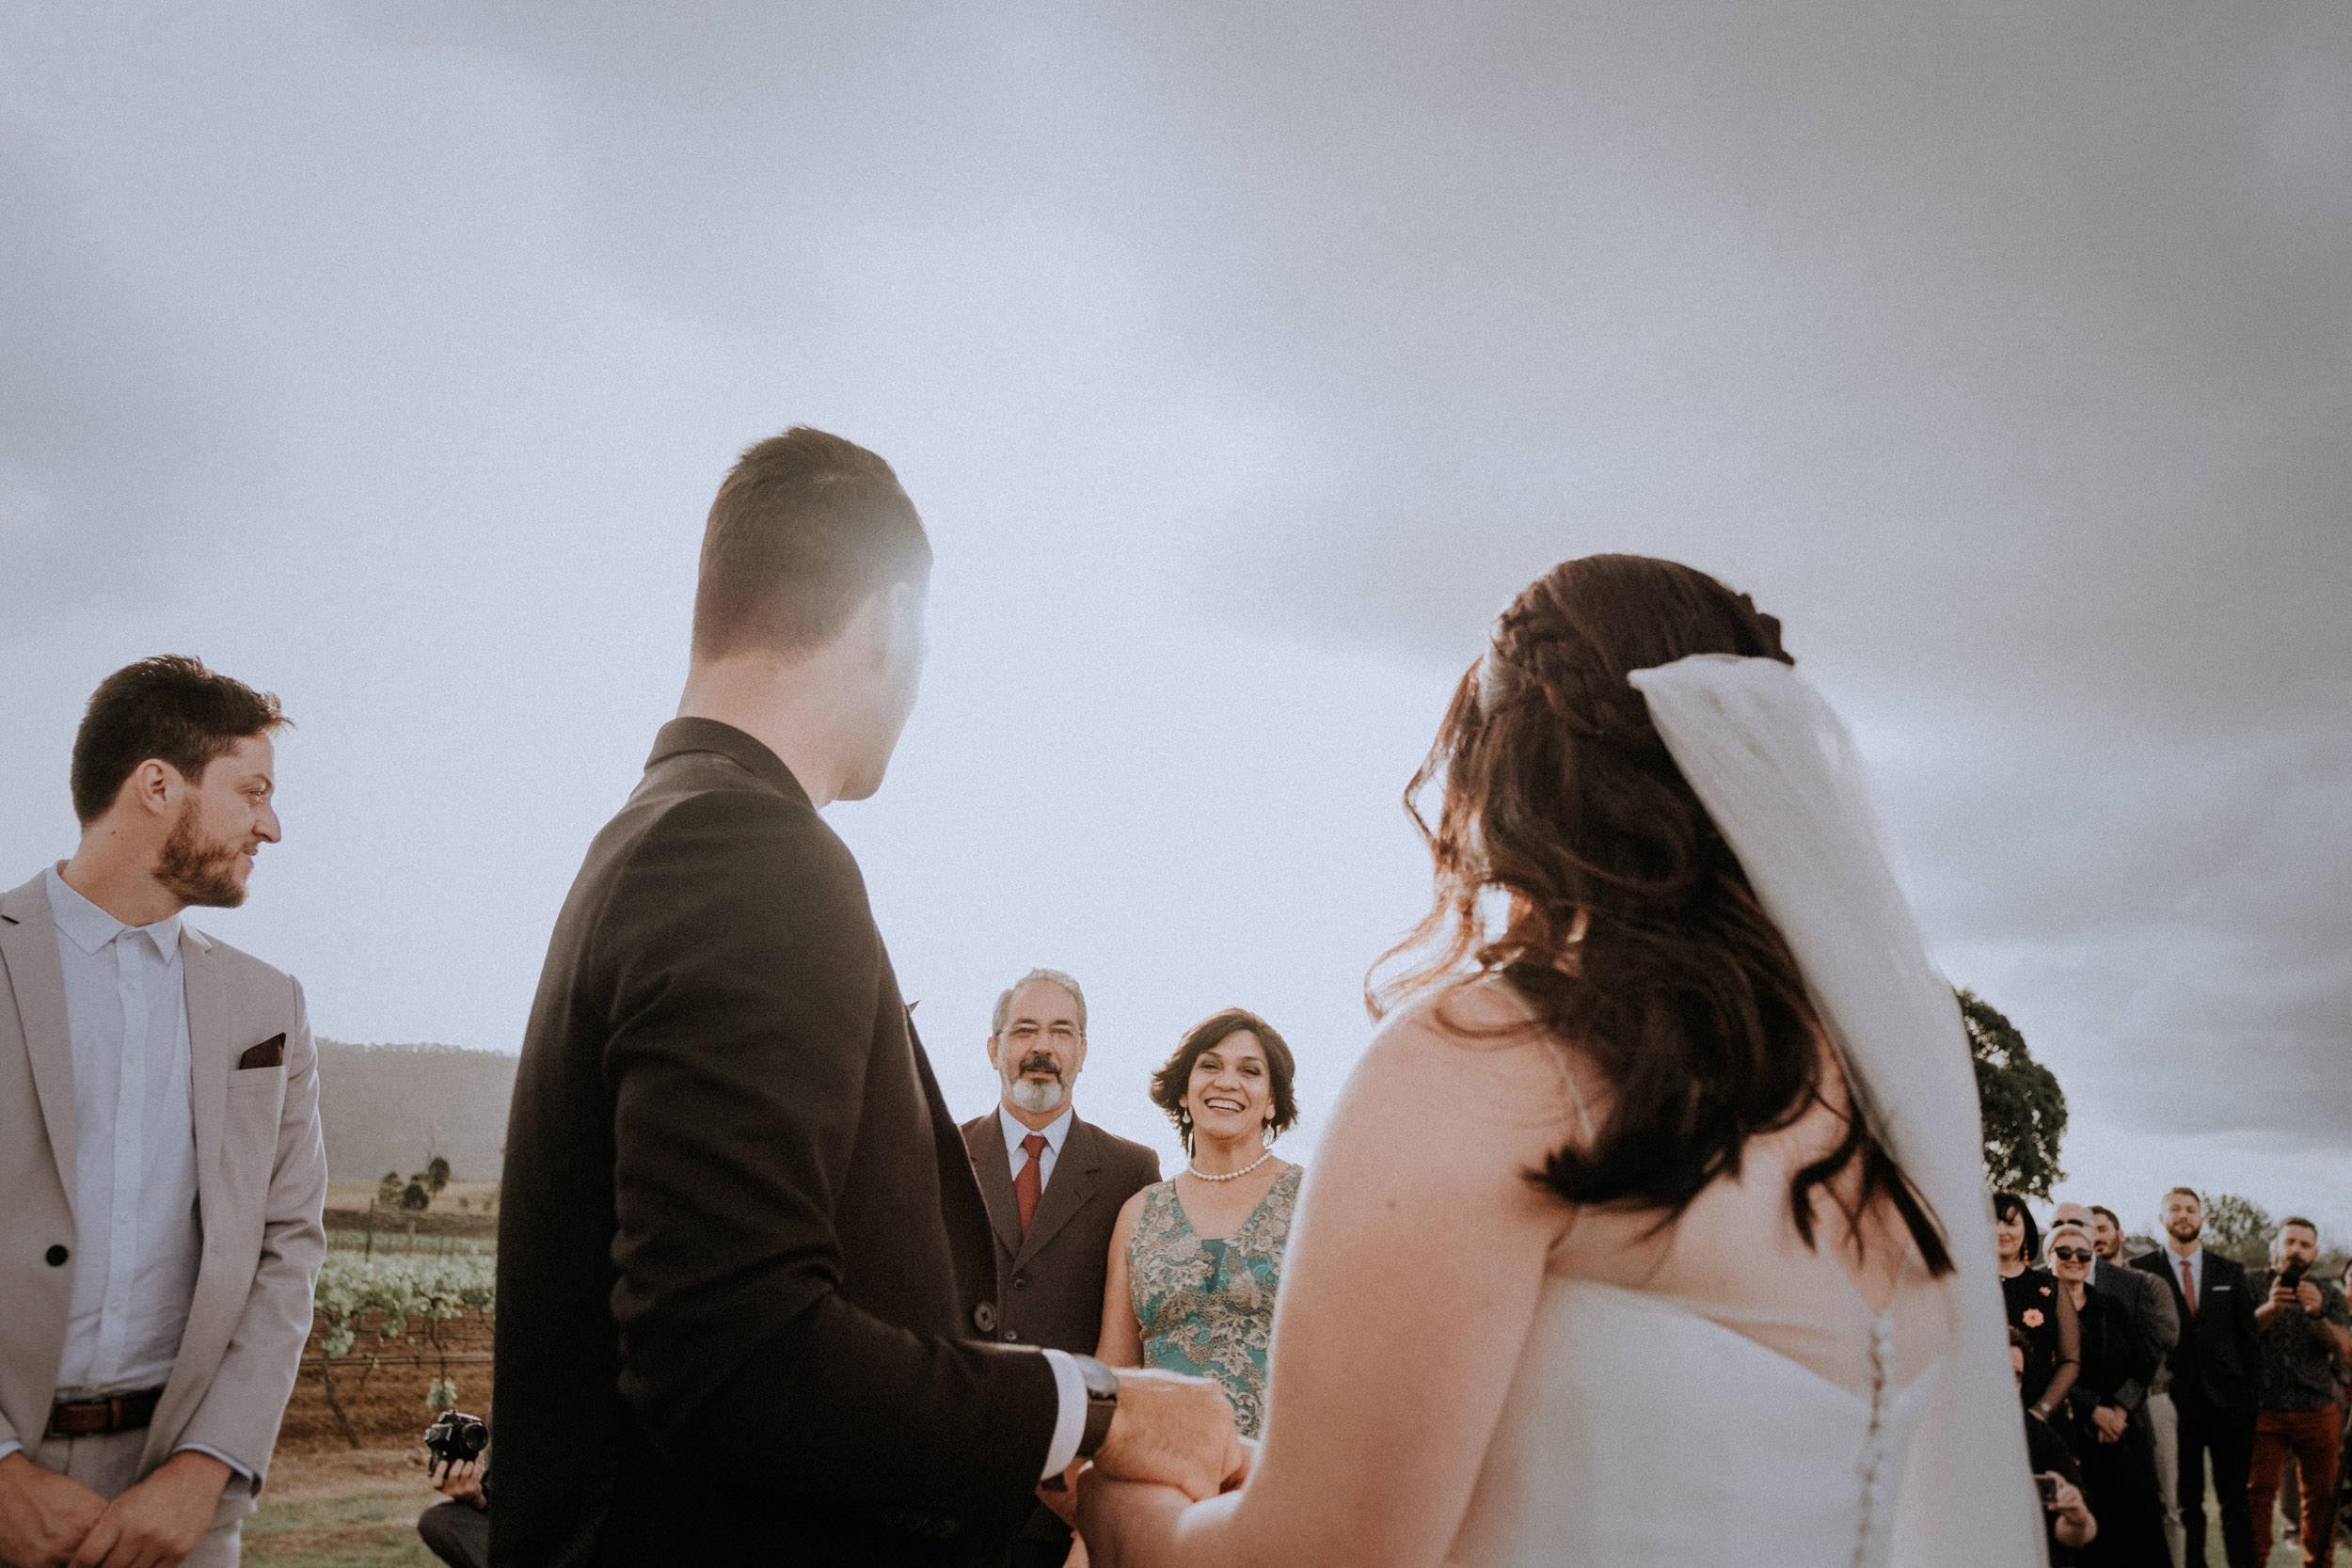 s+j_top_elopement wedding photography_kings & thieves_blog - 238.jpg